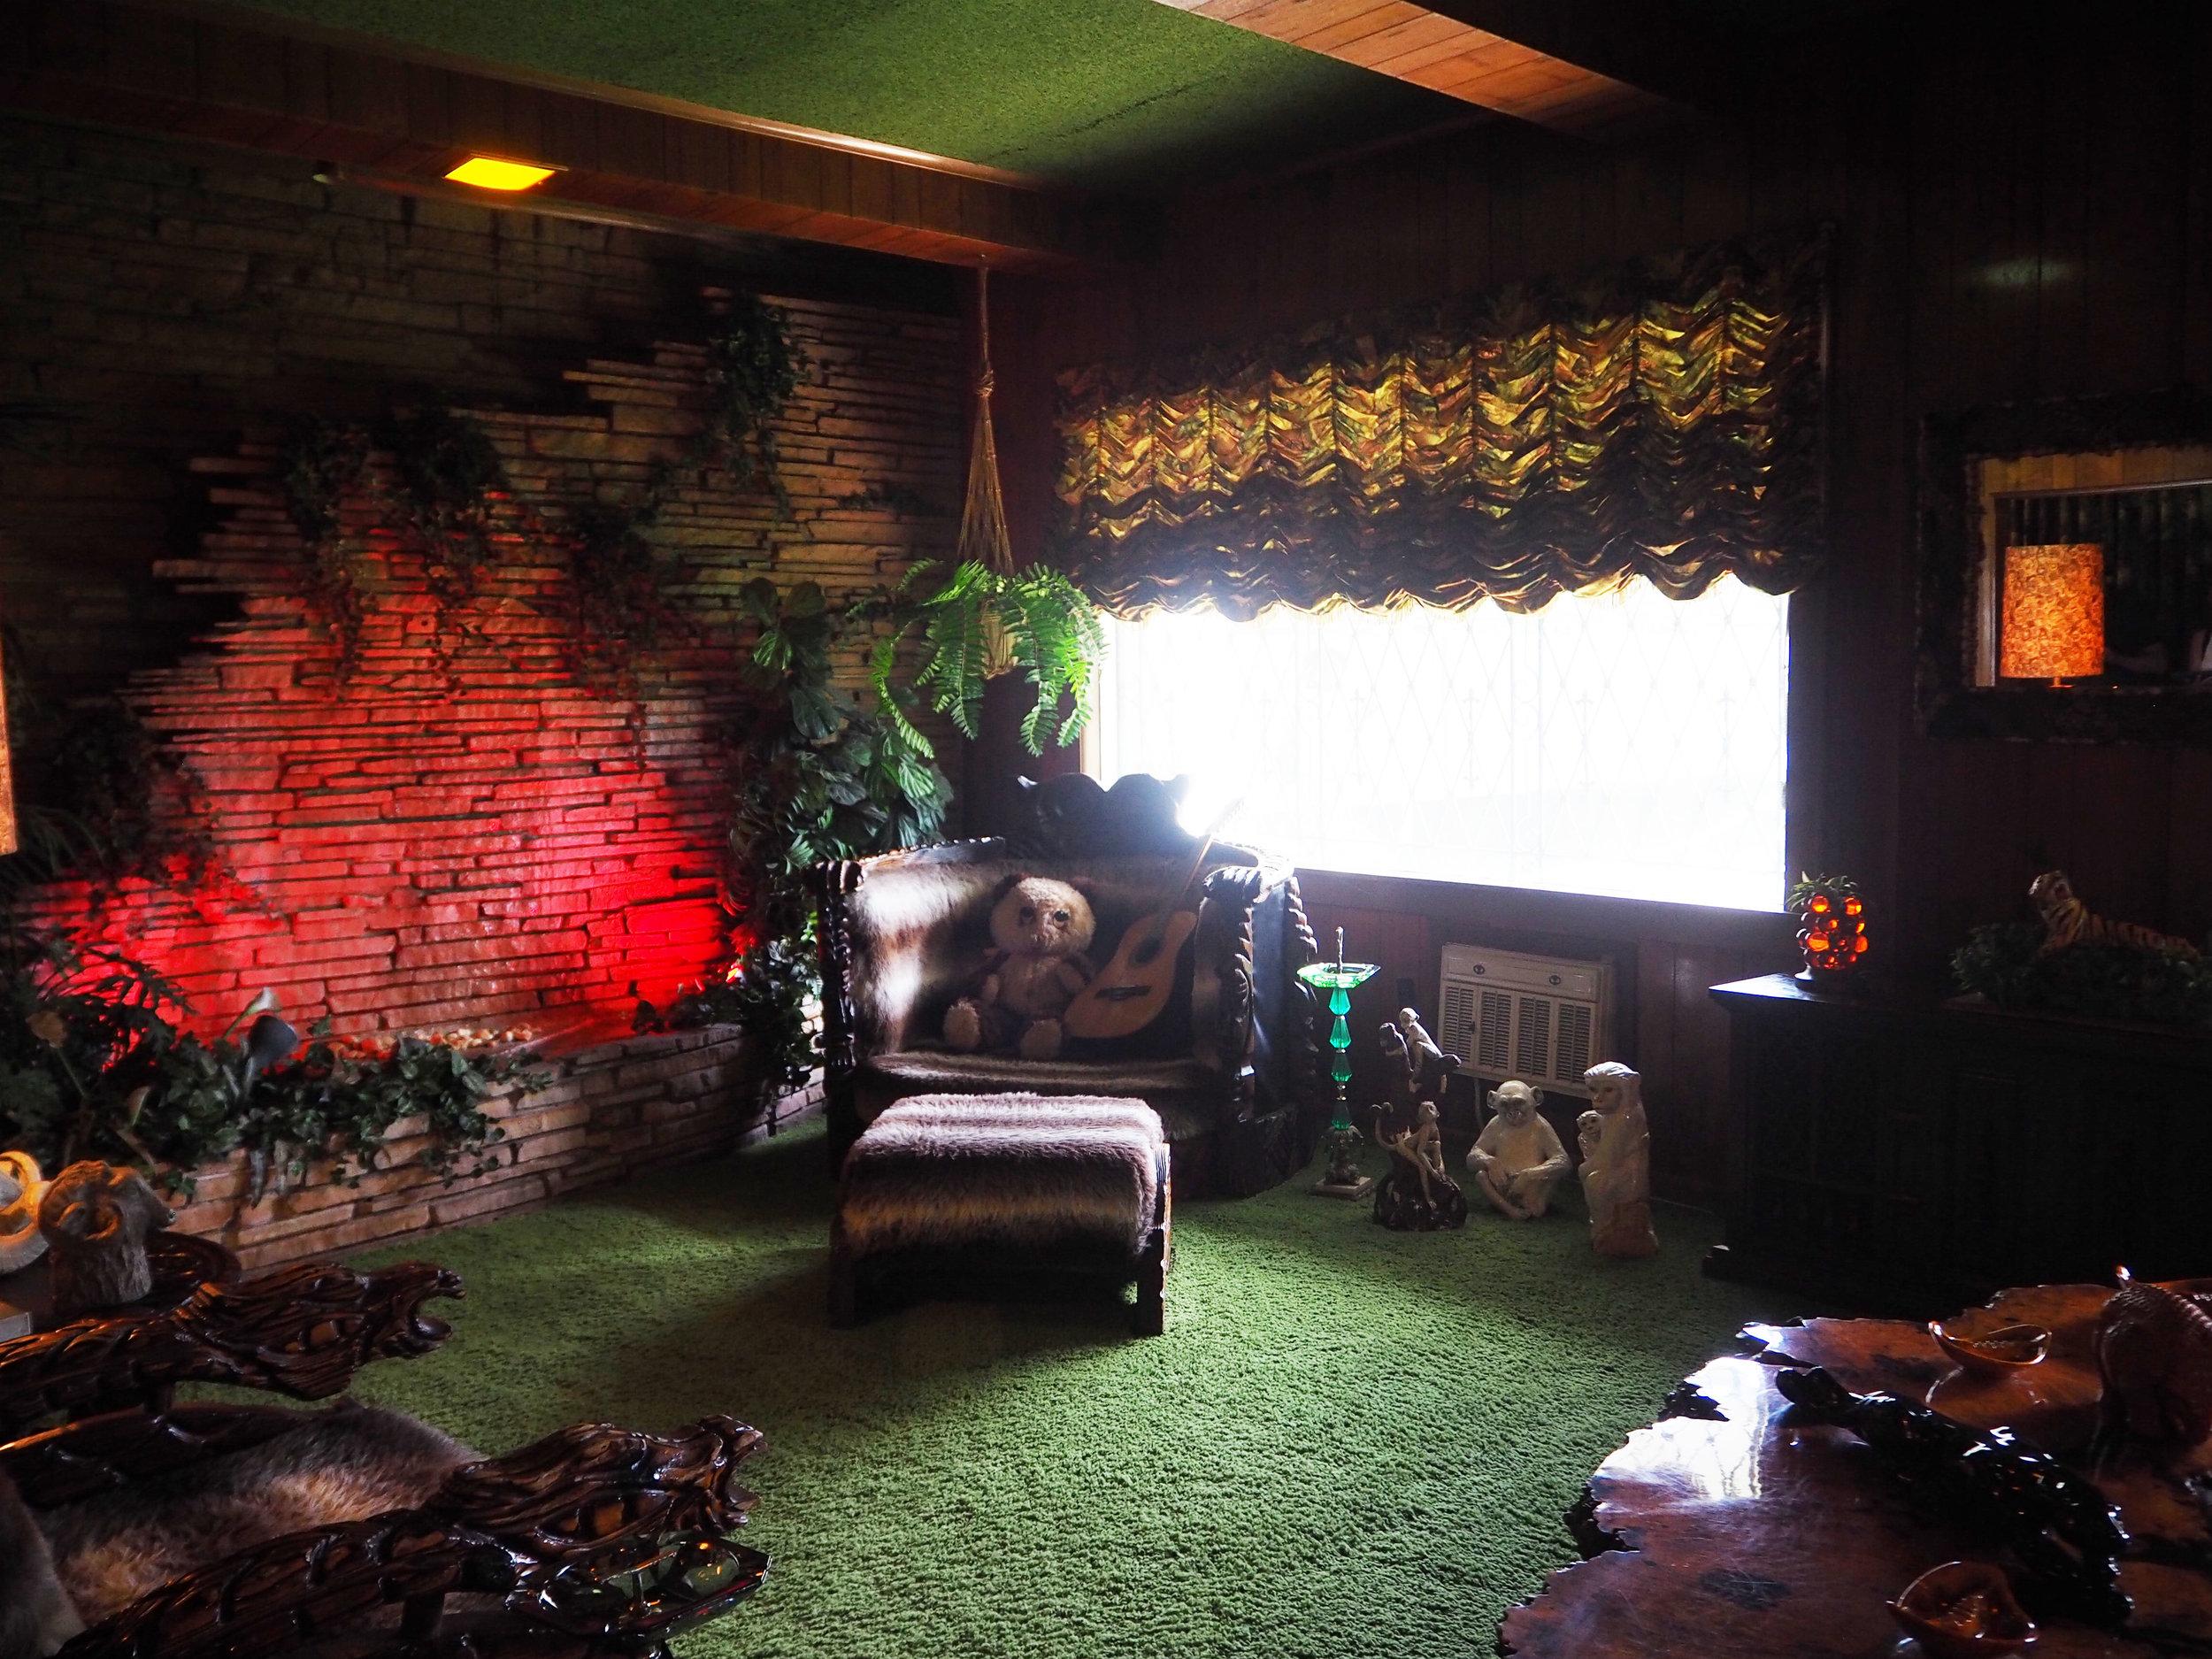 Elvis Presley | Graceland. The jungle themed room at Graceland. Click for more photos.